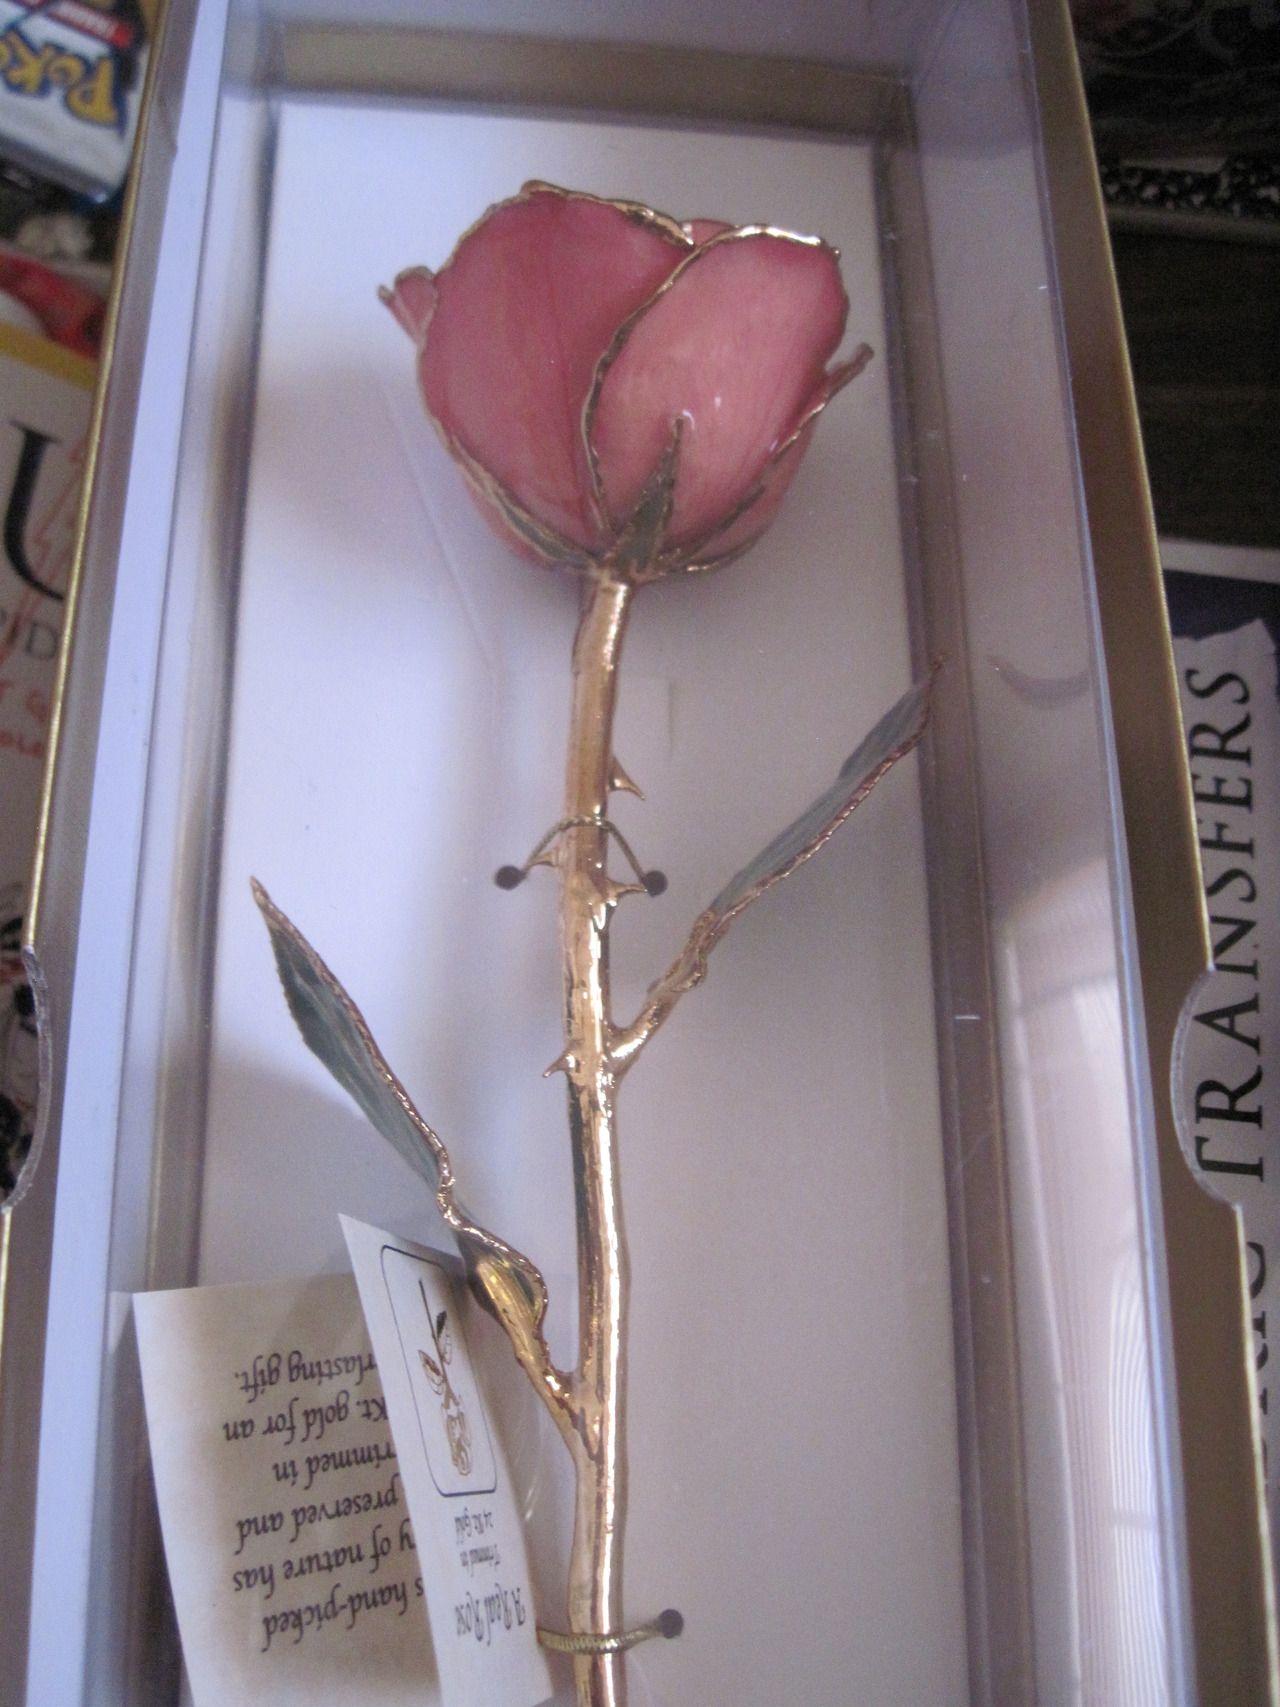 Strawberry Kimono Sillyboys Girlsareforgirls Eloarei My Romantic Gifts Beauty And The Beast Forever Rose